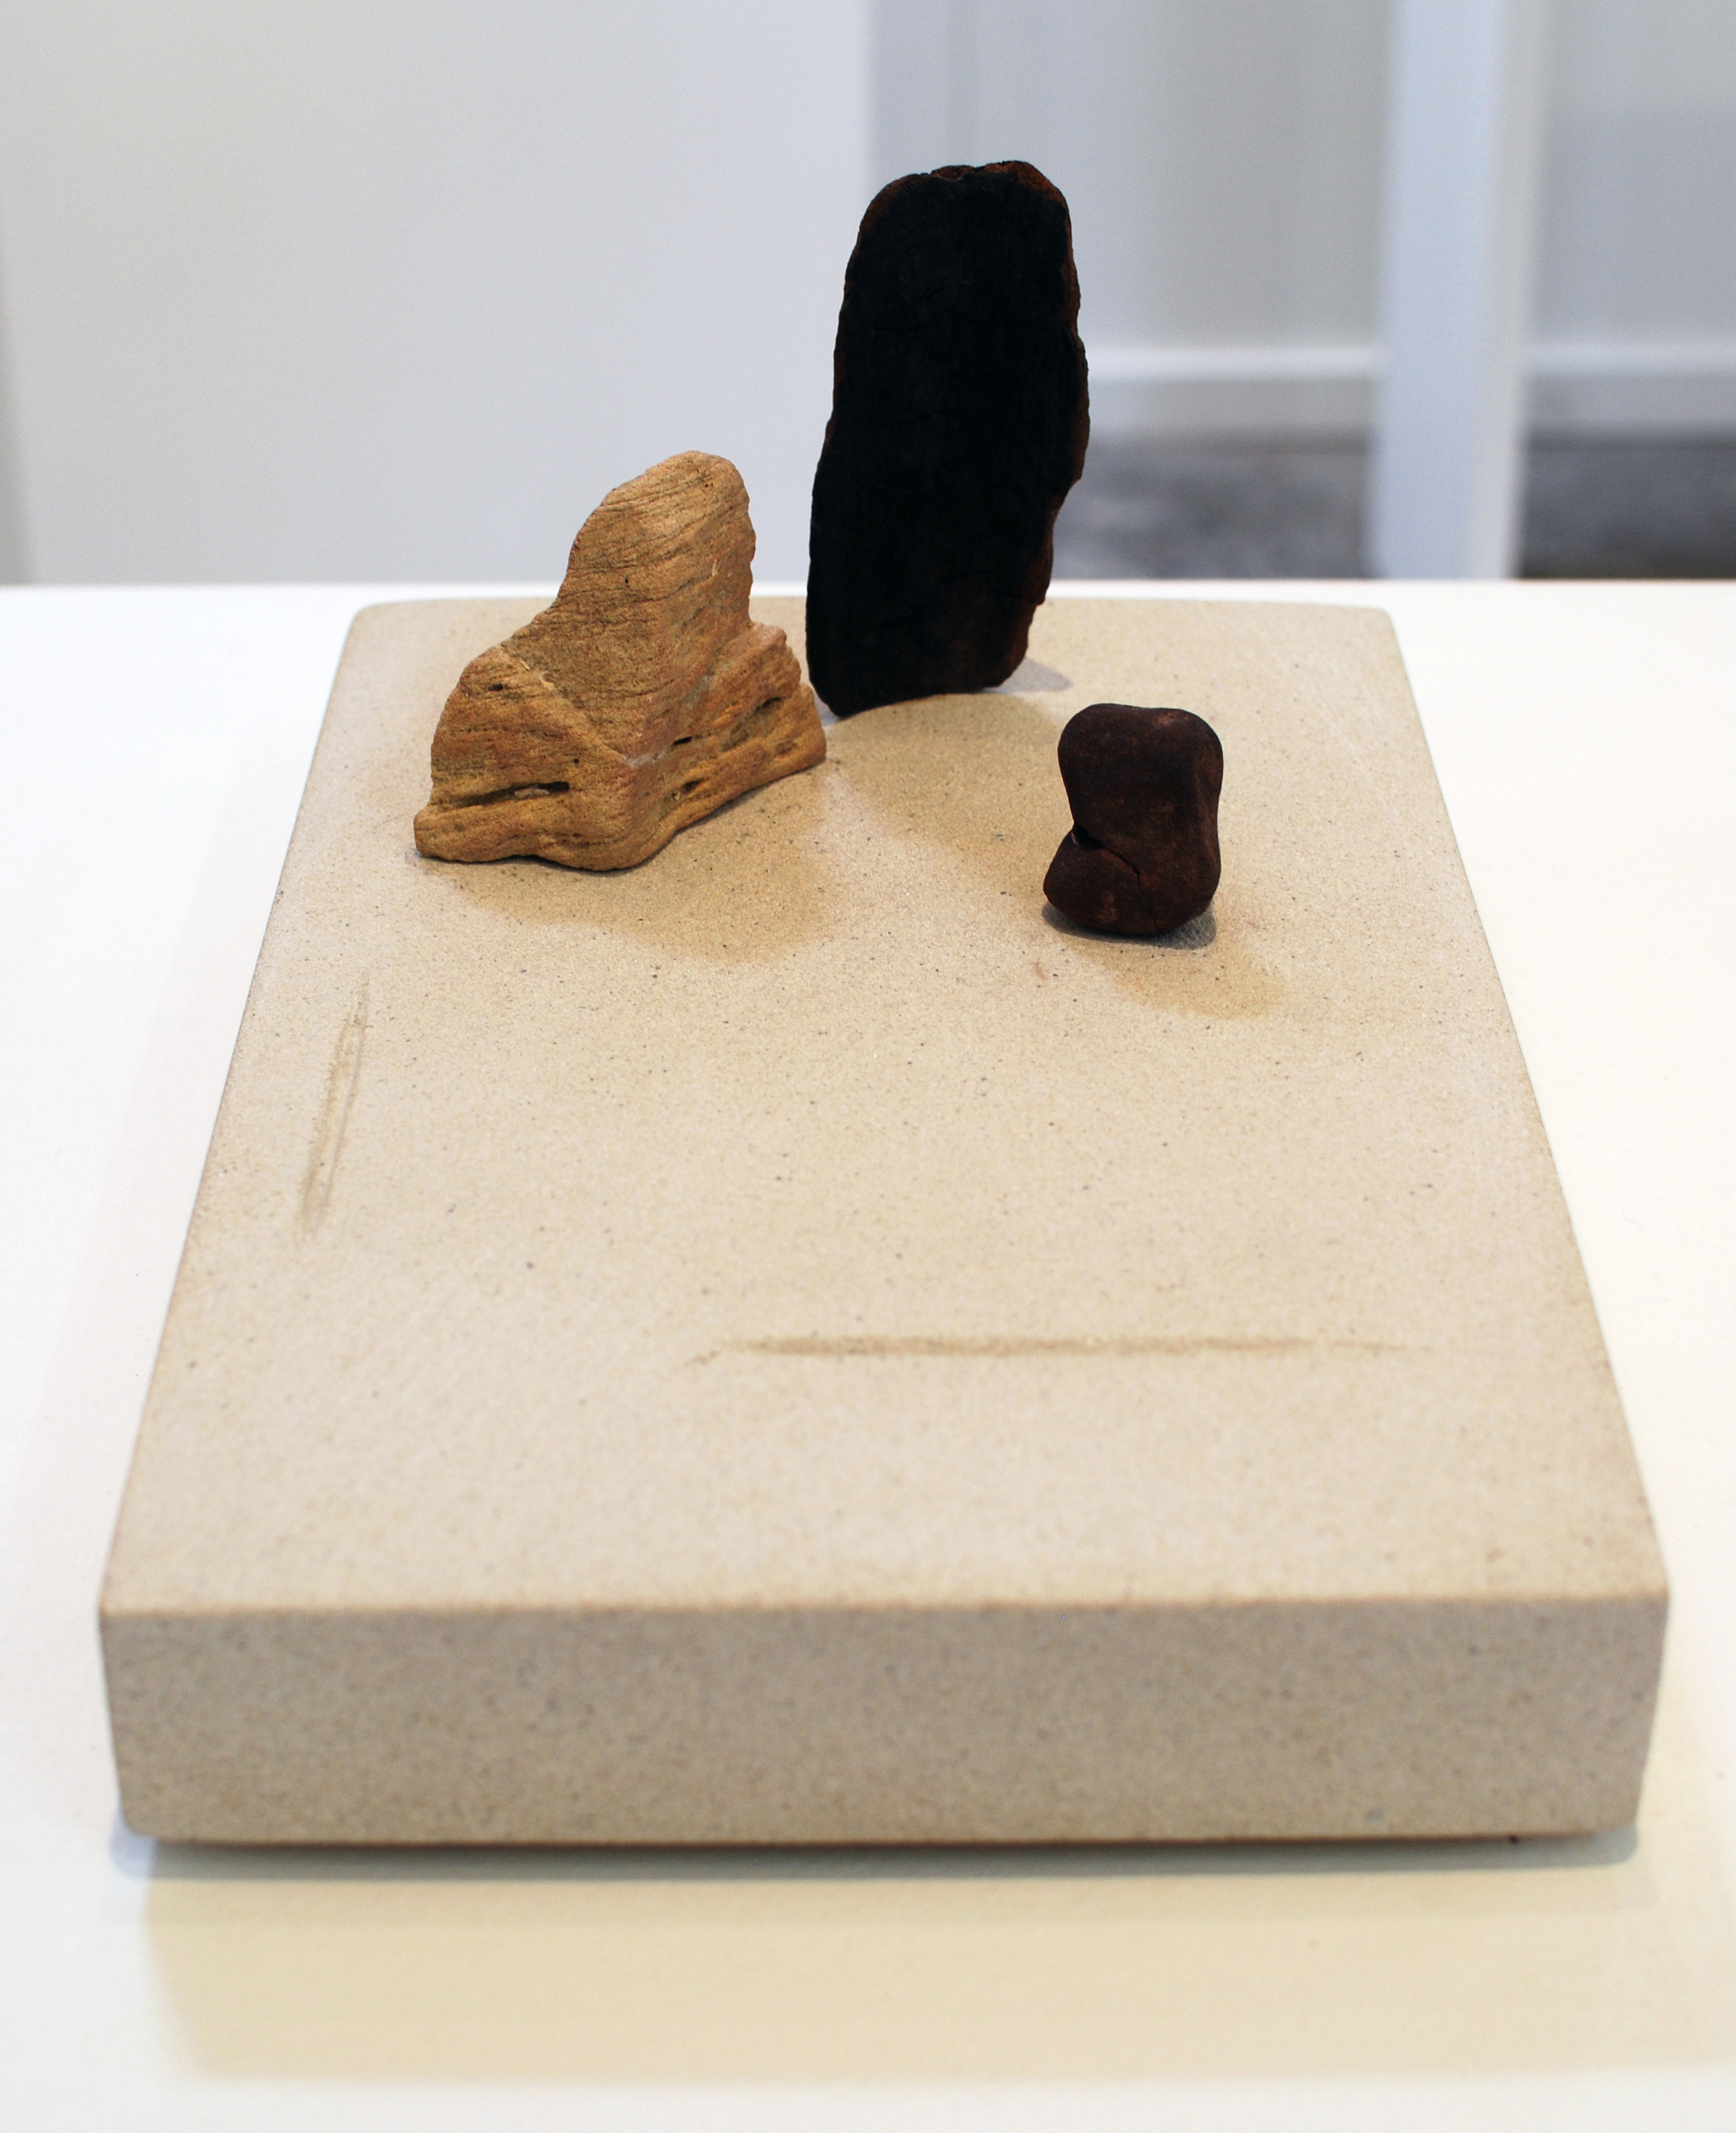 Copy of 'Zen Stonescape 1', Simon Gandevia, Burnt wood and two stones on Sandstone base.